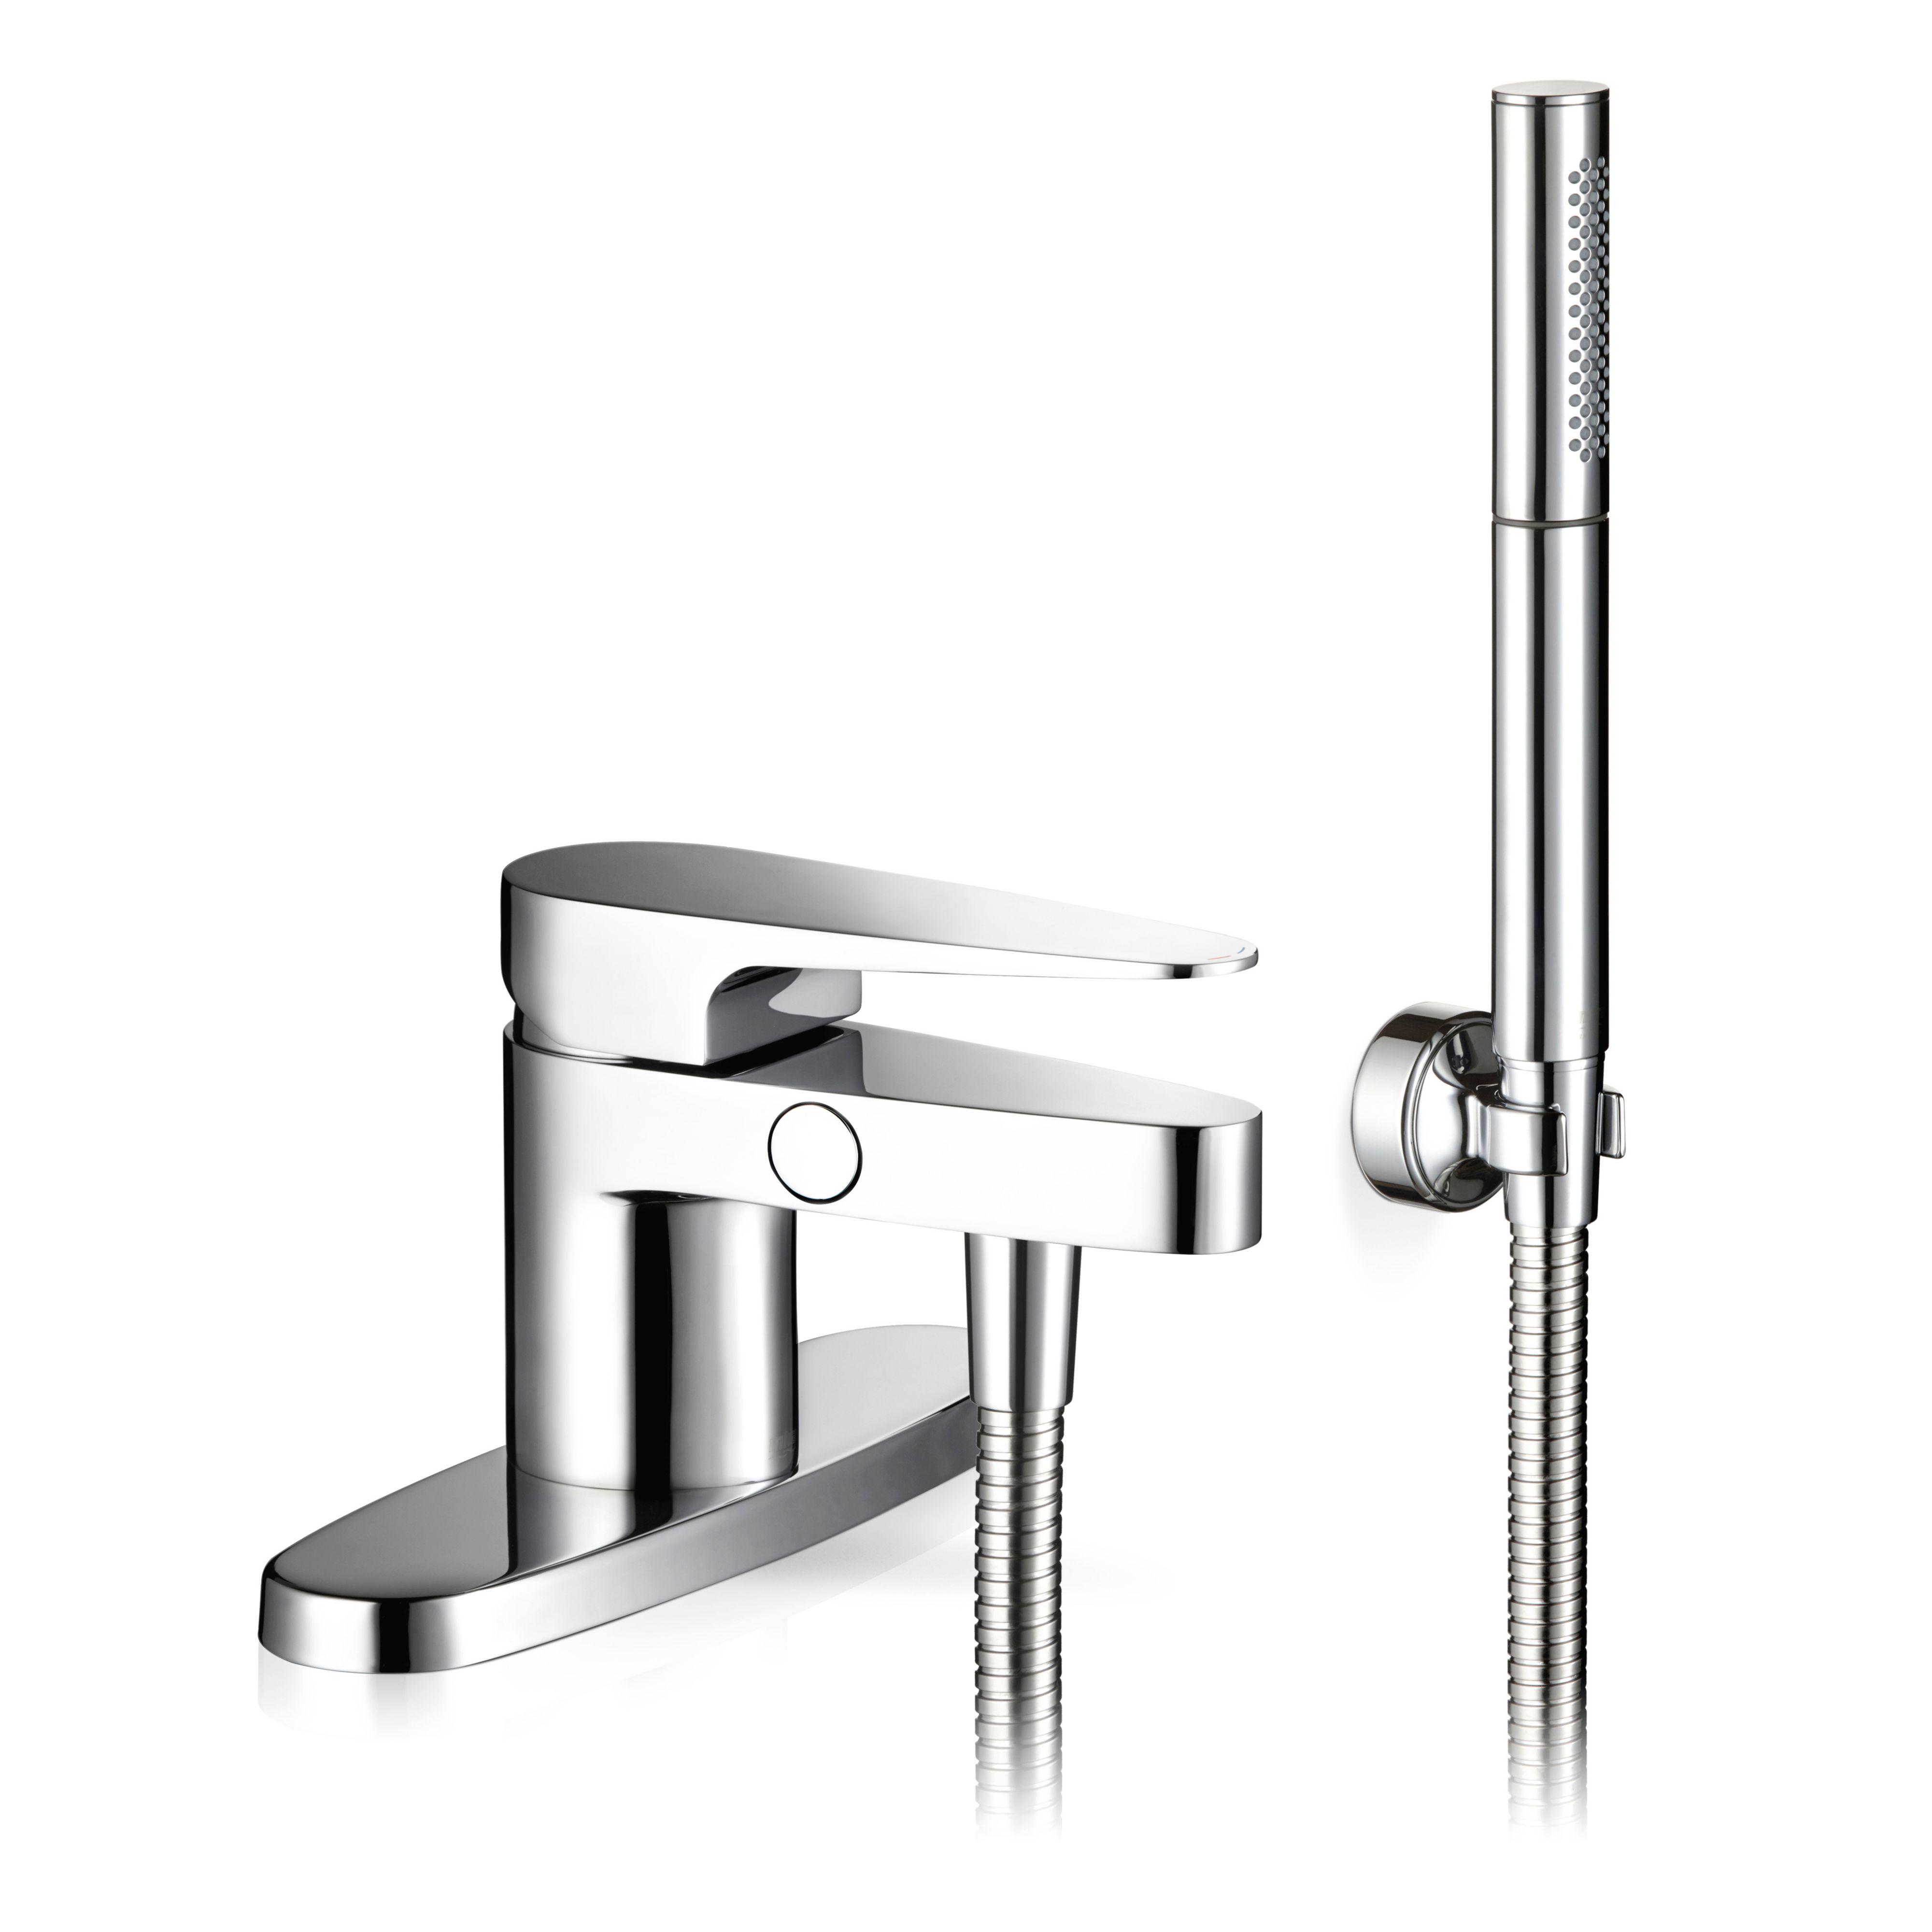 Mira Precision Chrome Bath Shower Mixer Tap